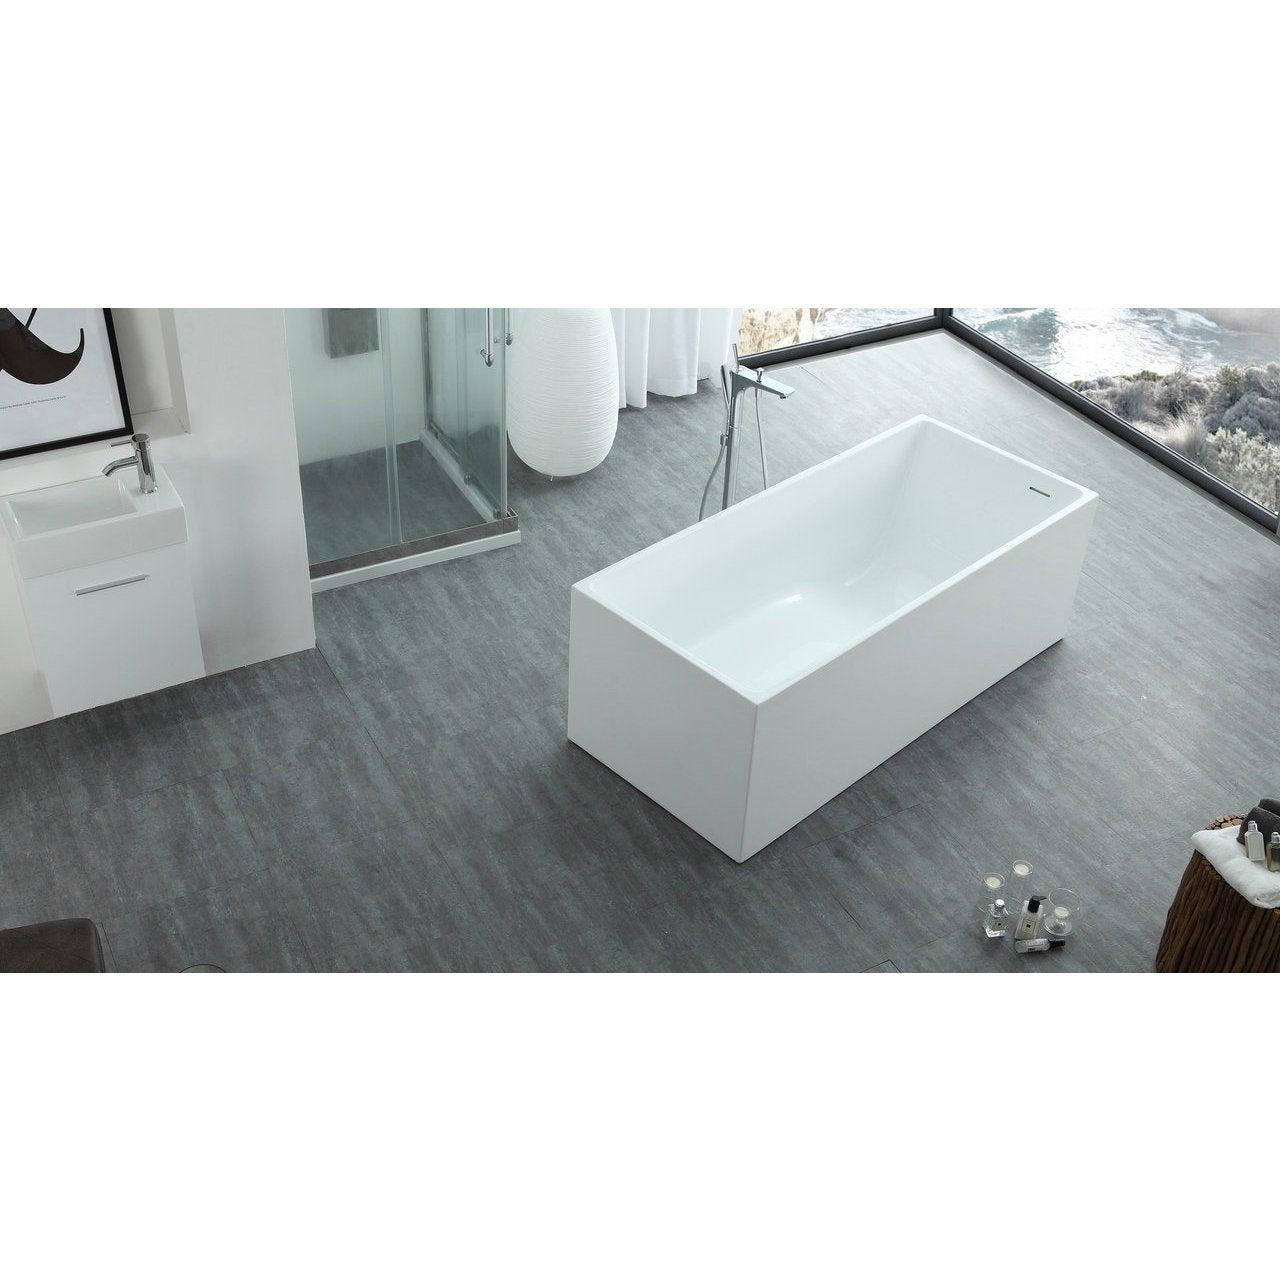 Shop HelixBath Pompeii Modern White Rectangle Slope Bathtub with ...